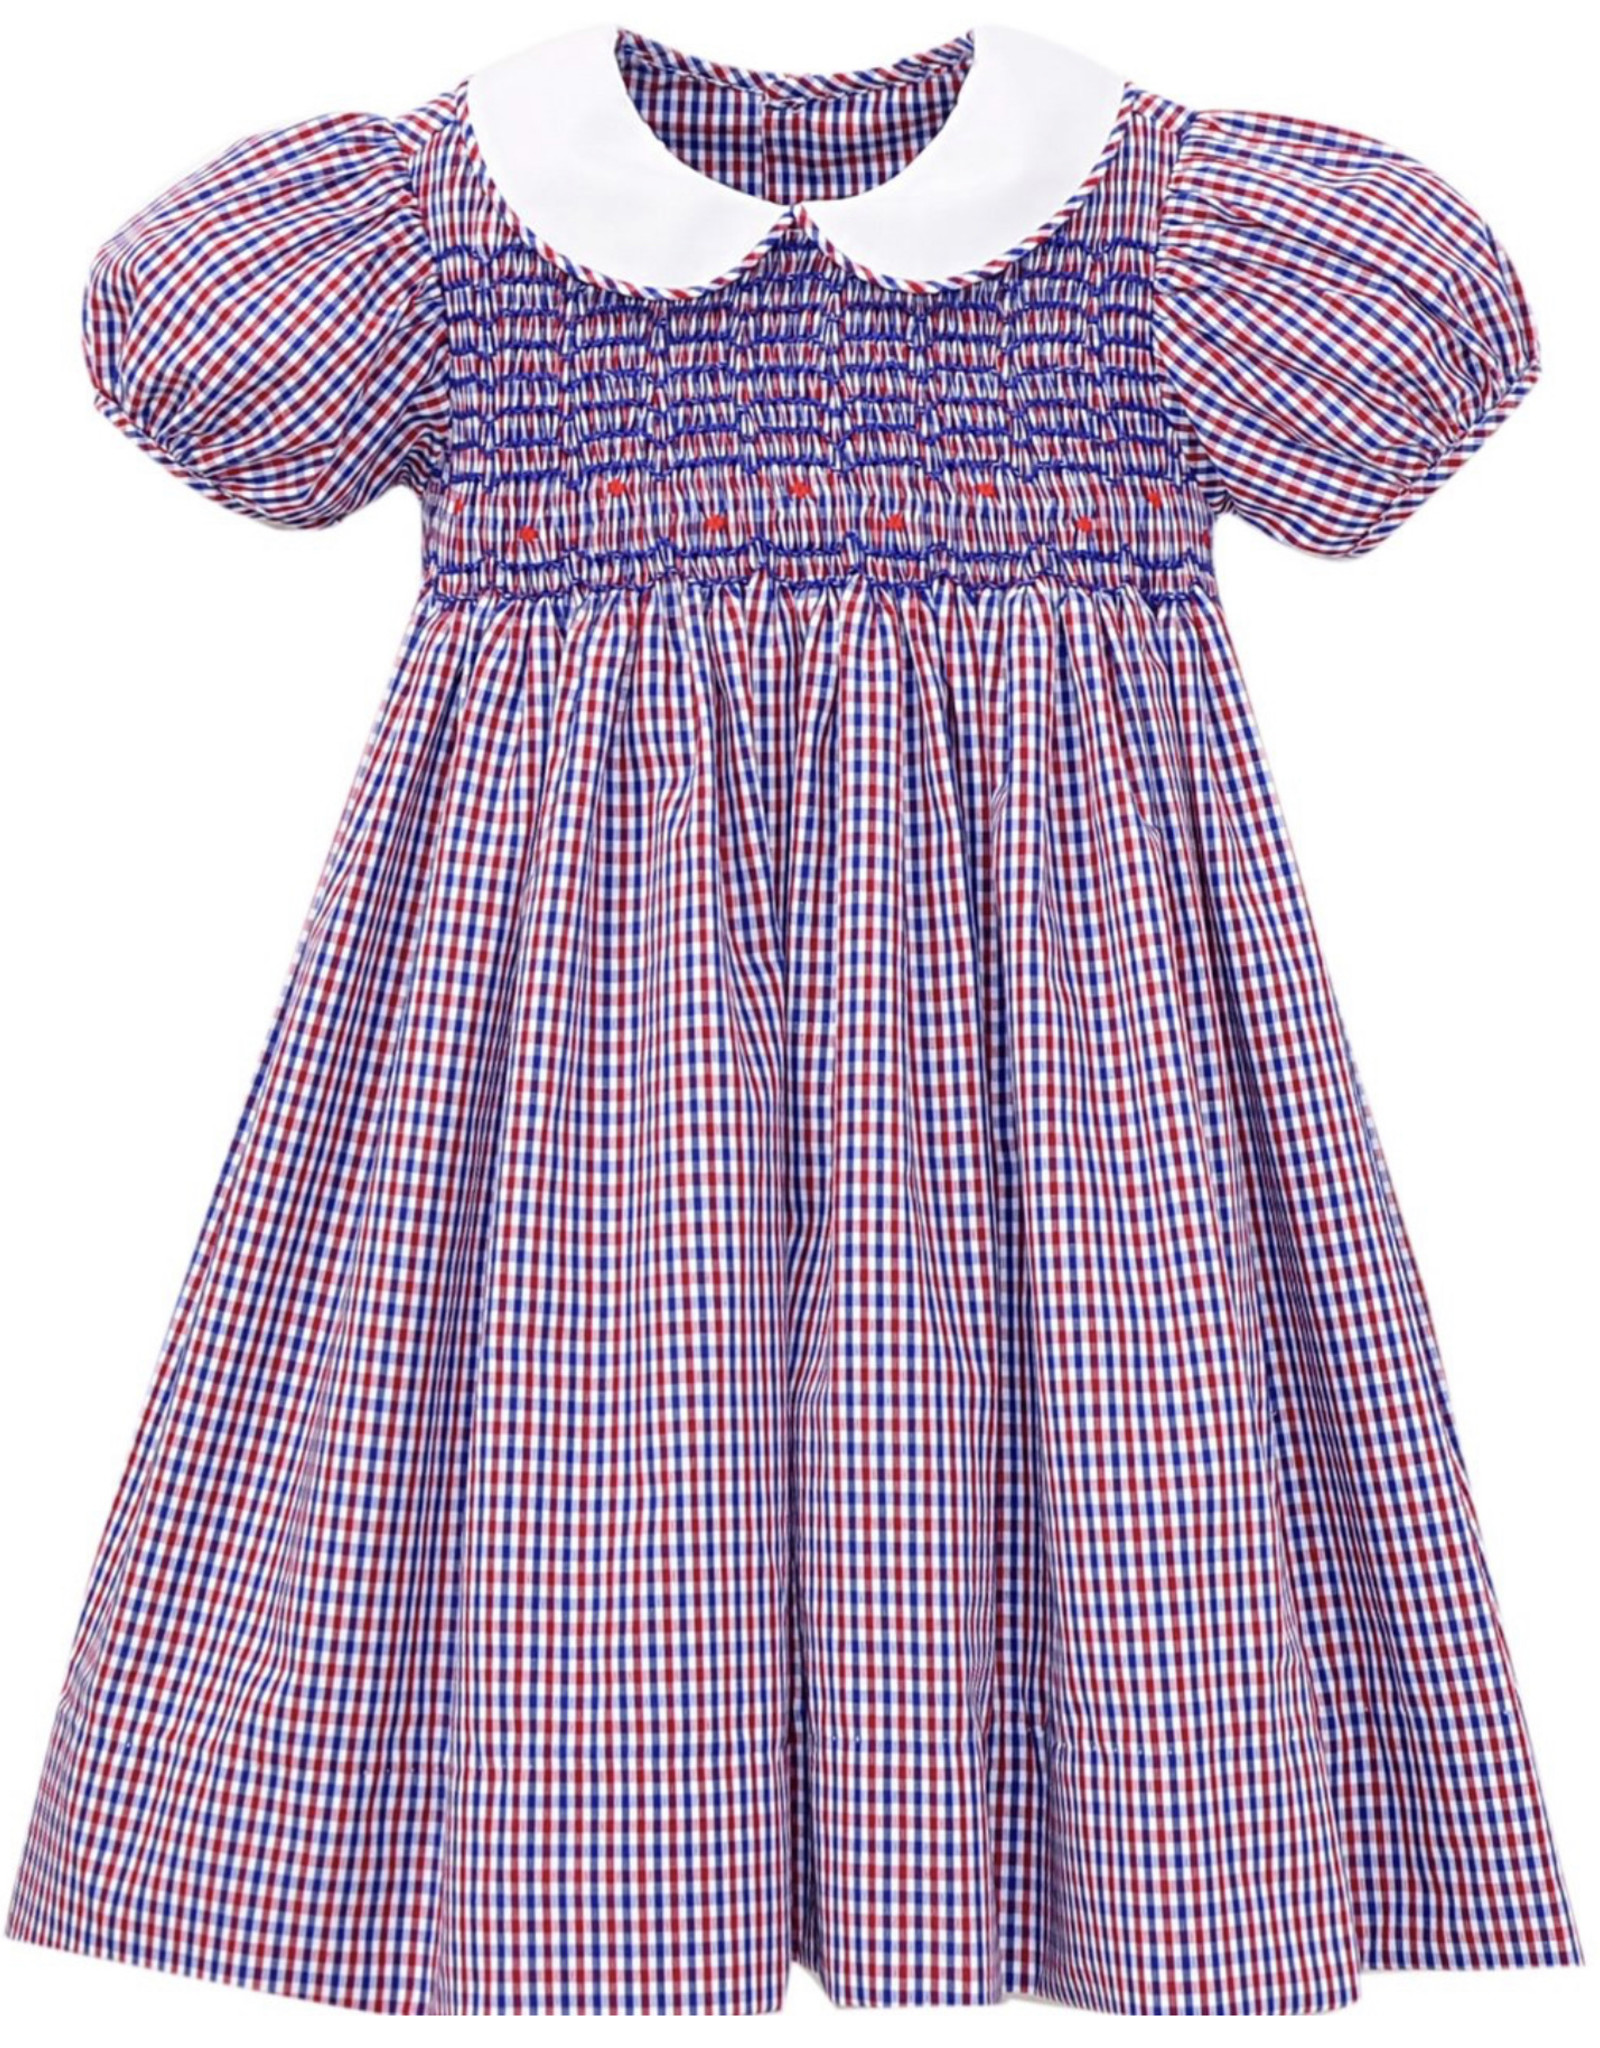 LullabySet Red And Blue Plaid Kelli Dress